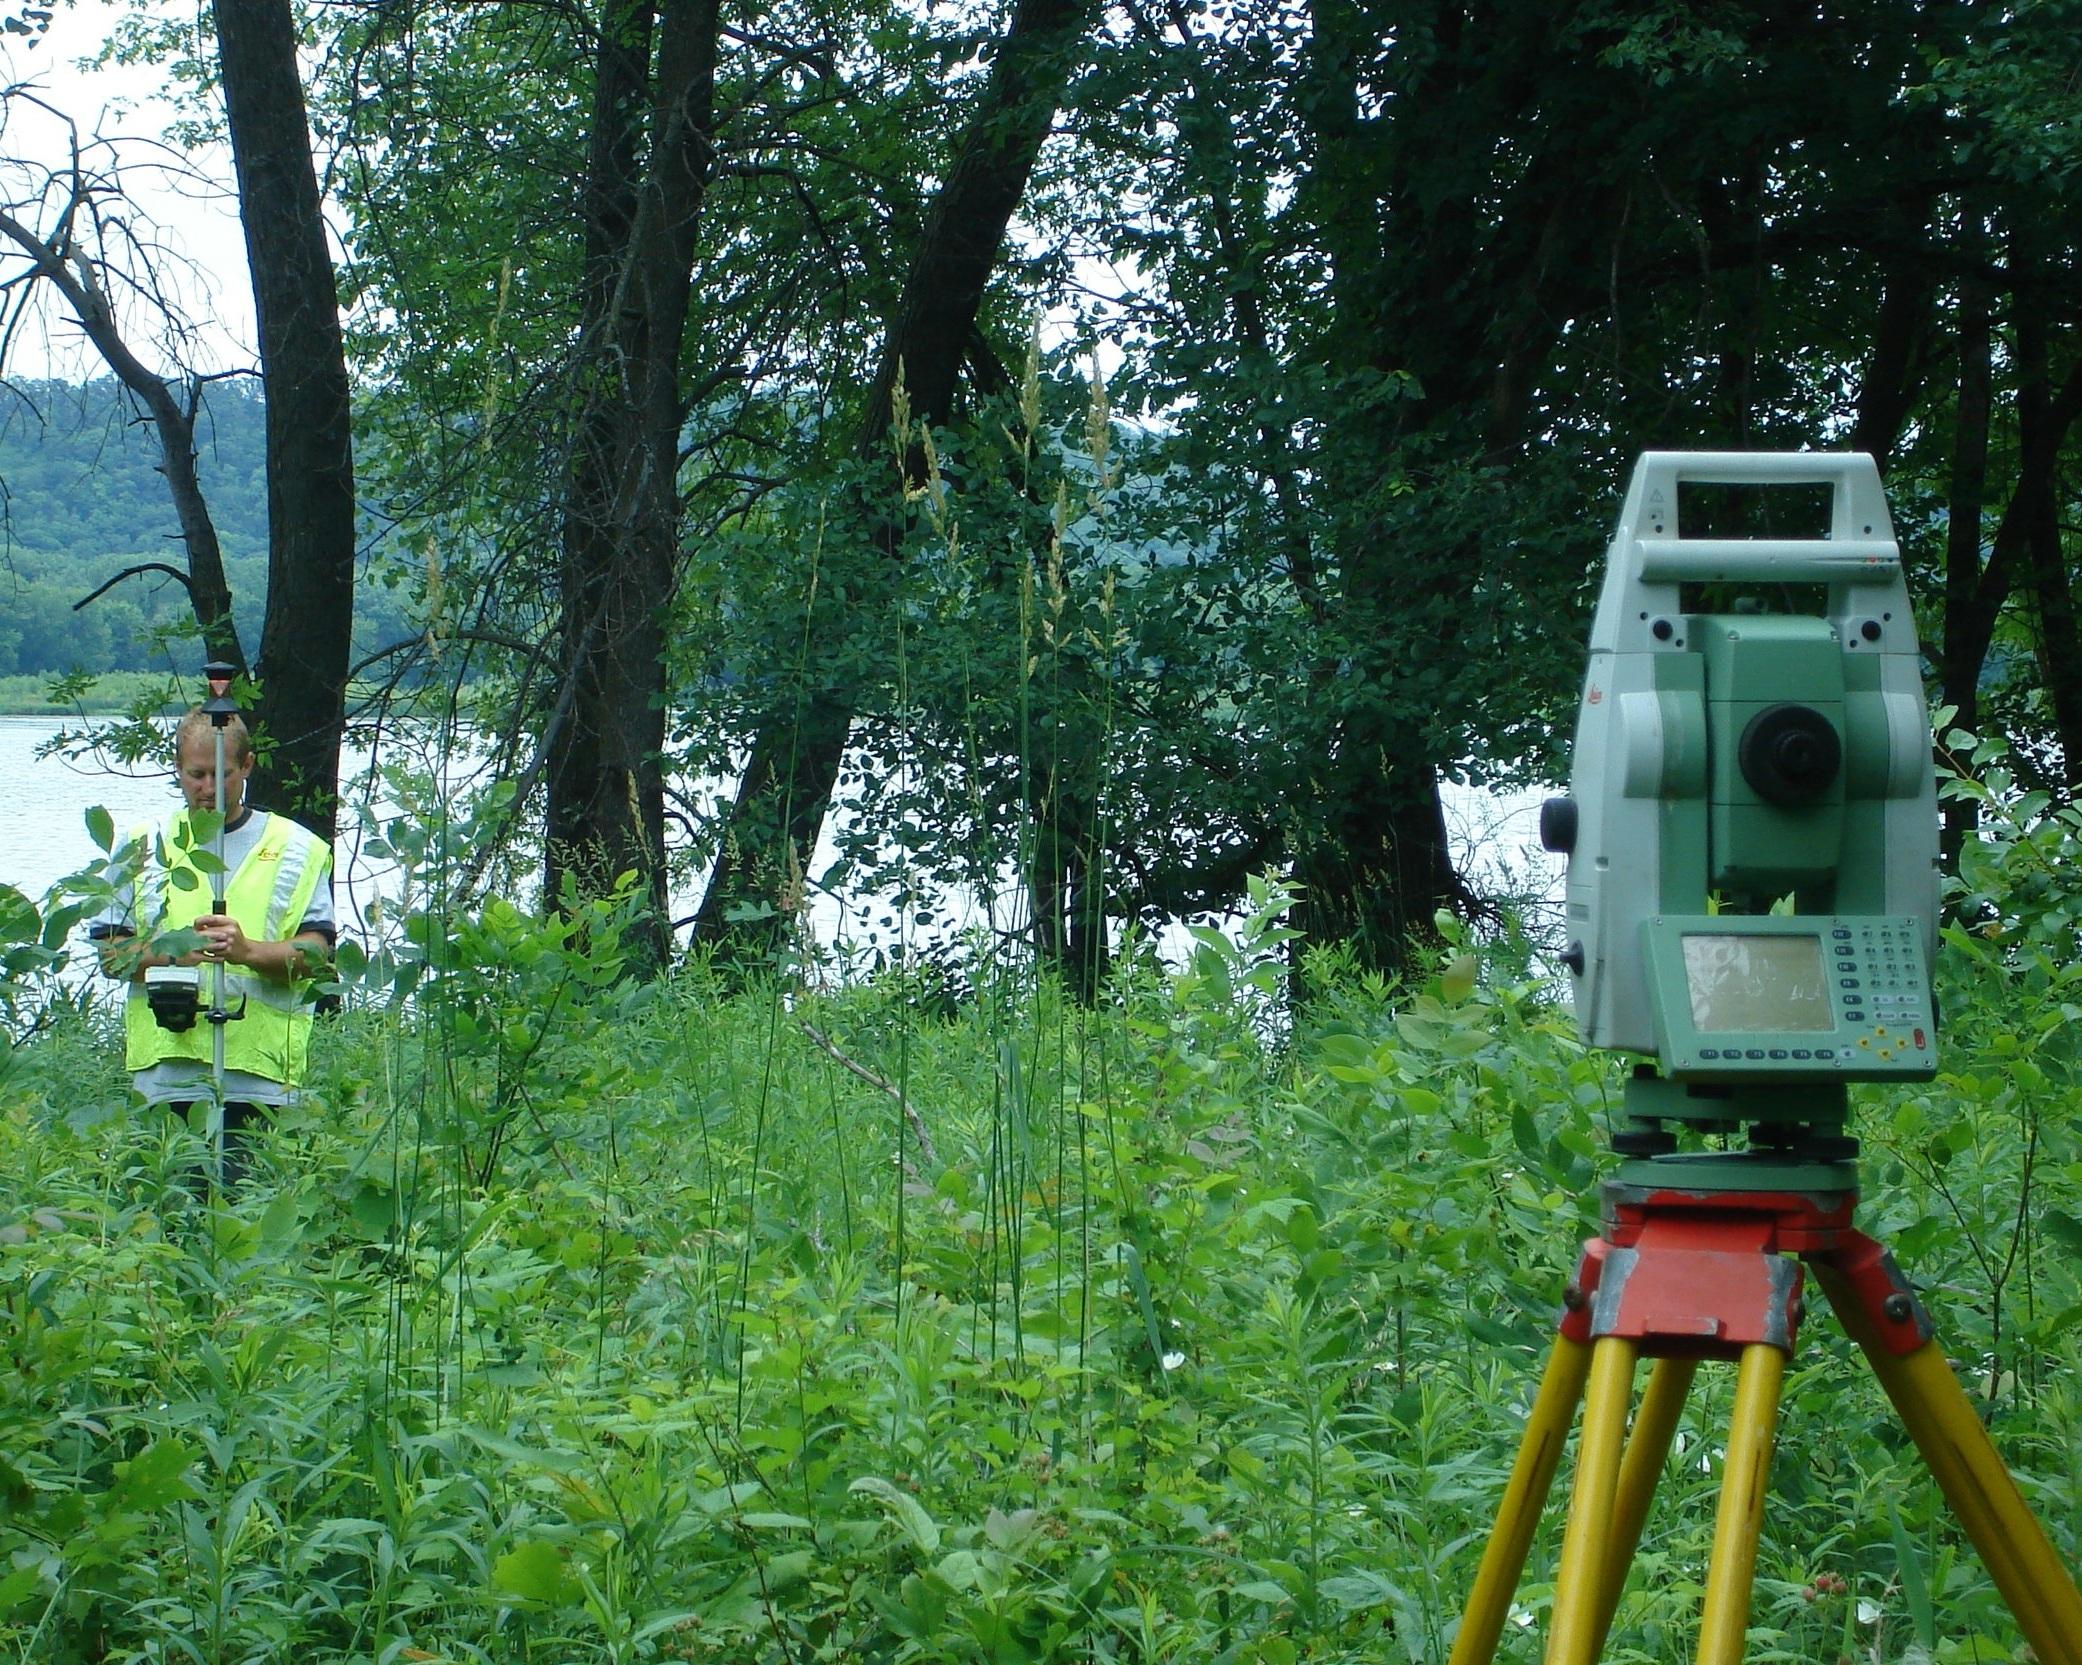 Land Surveying Services - When Do I Need A Survey?Boundary SurveysTopographic SurveysFlood SurveysPlattingALTA/ACSM Land Title SurveysConstruction & Utility StakingAs-Built Surveys